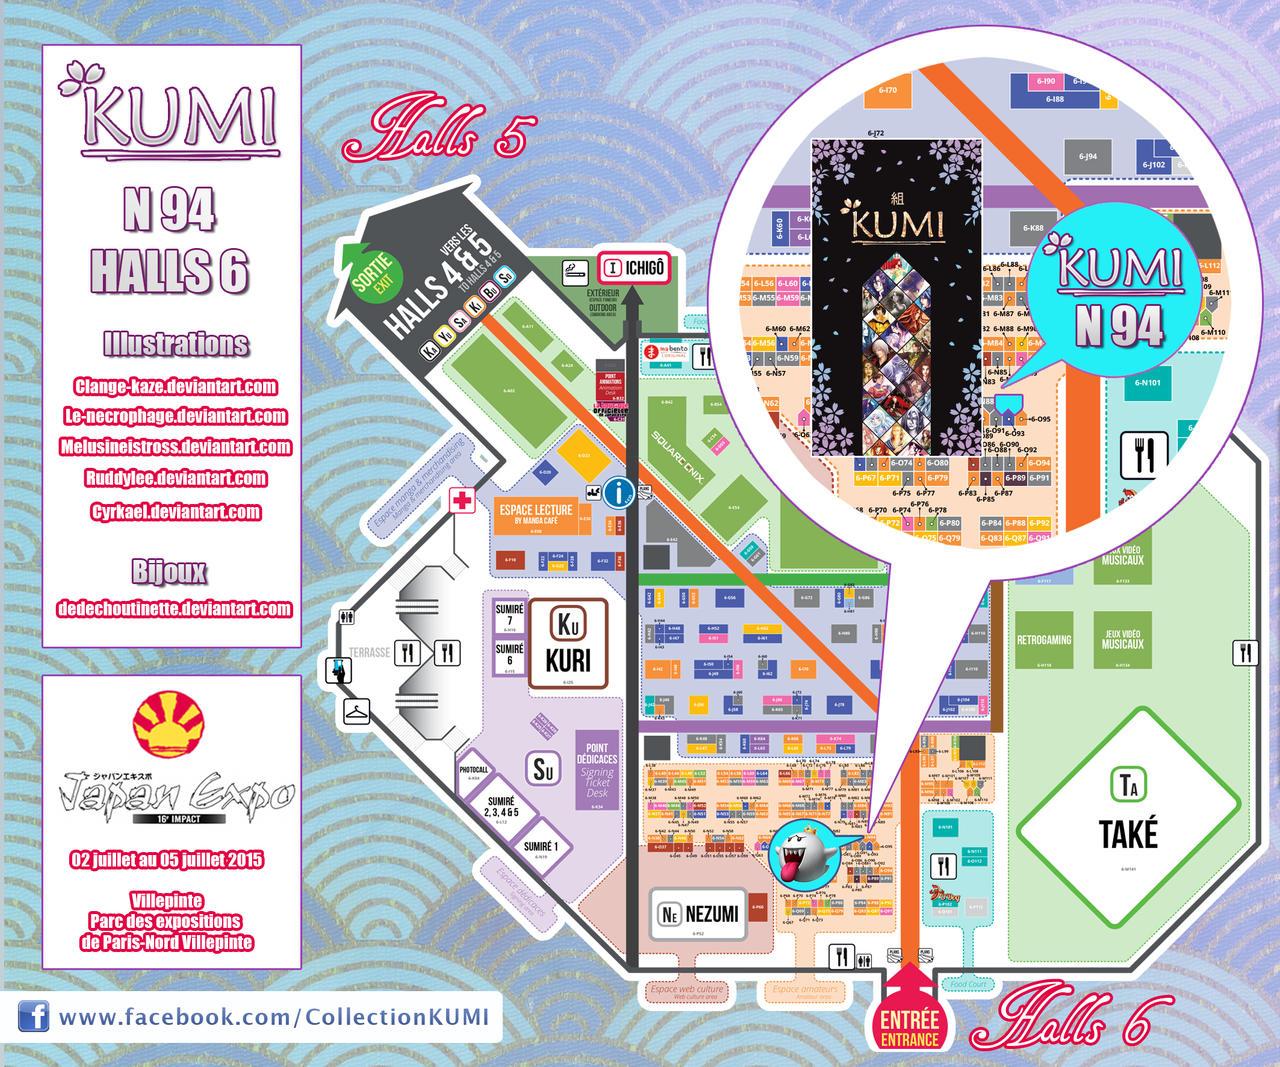 Plan Japan Expo 2015 - KUMI - N94 by Clange-kaze